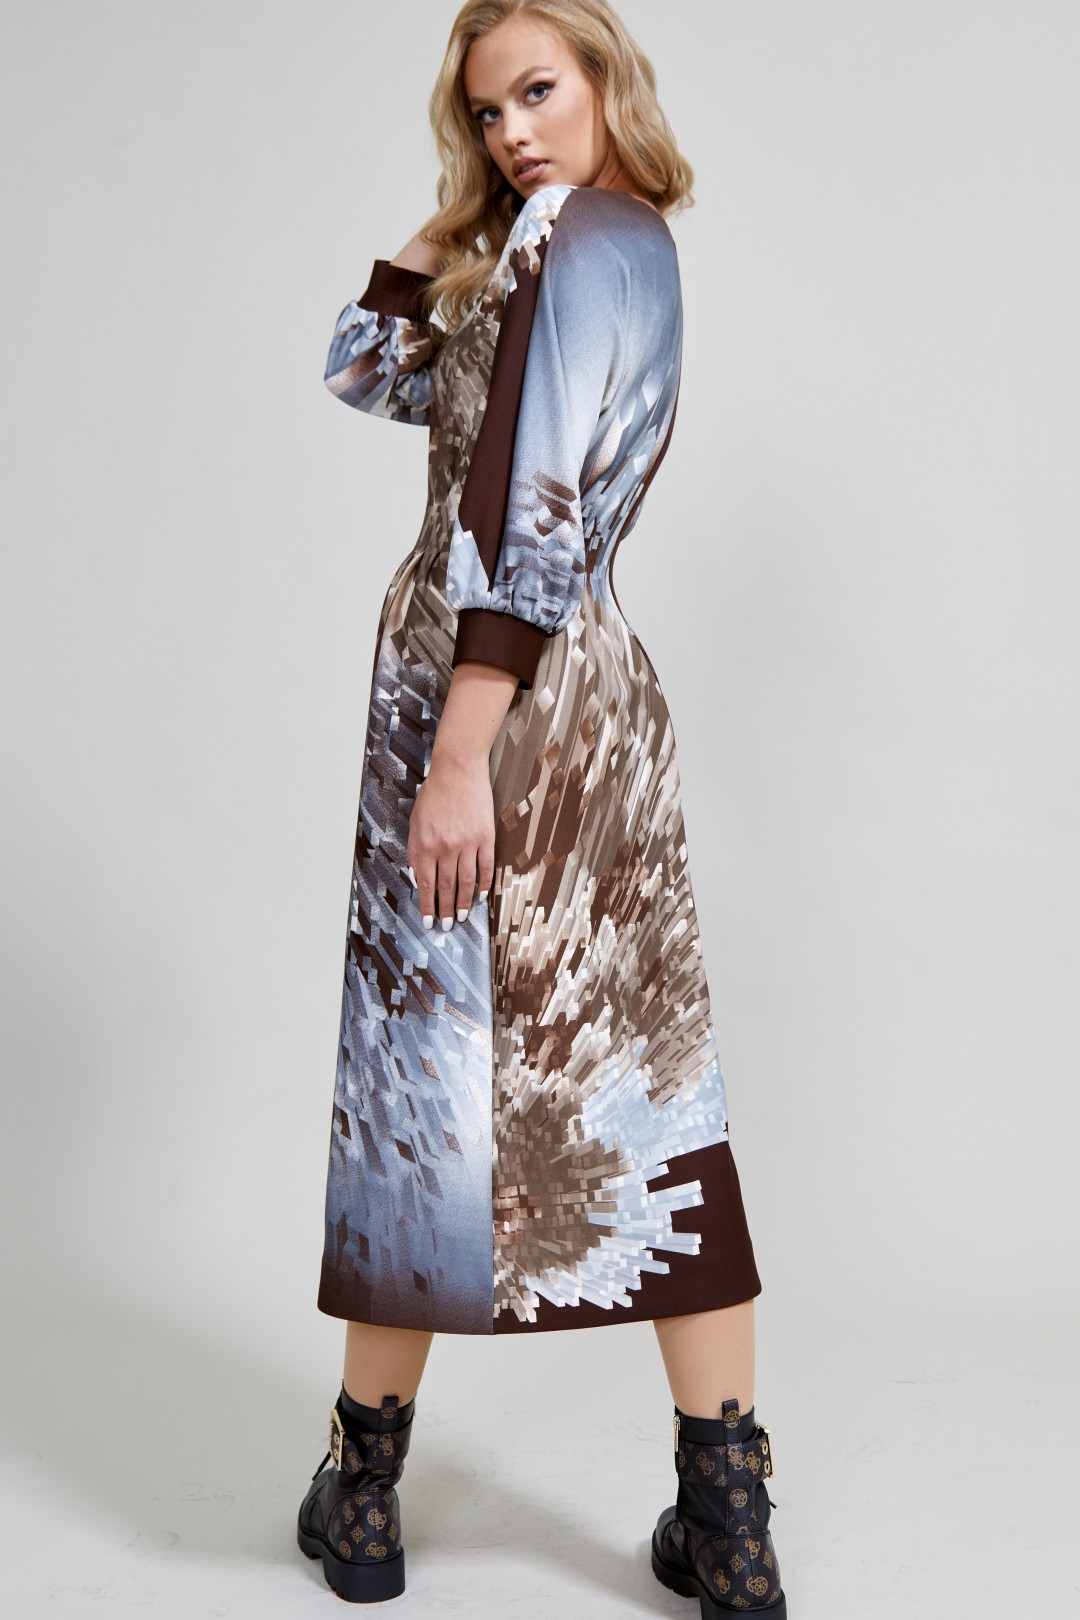 Платье ТЭФФИ-стиль 1592 молочный шоколад + кристаллы